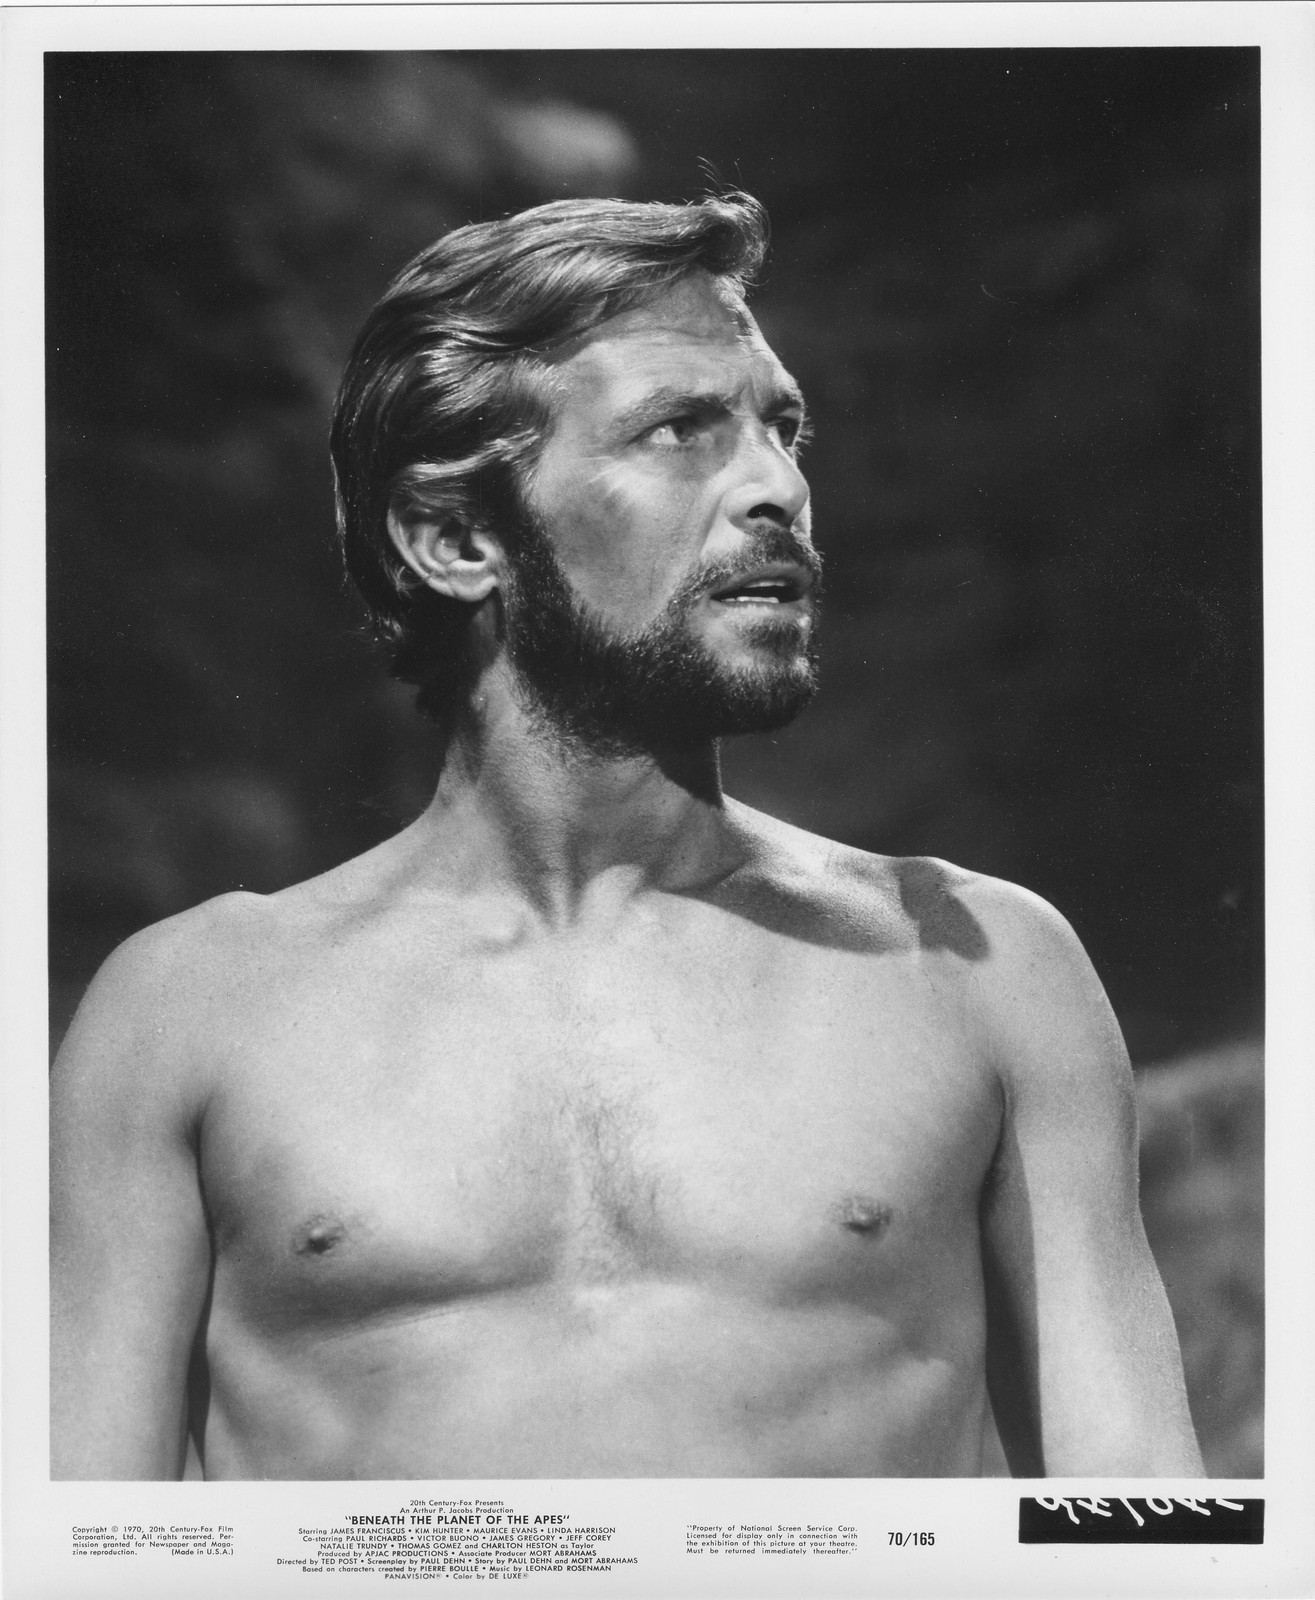 James franciscus nude Nude Photos 89